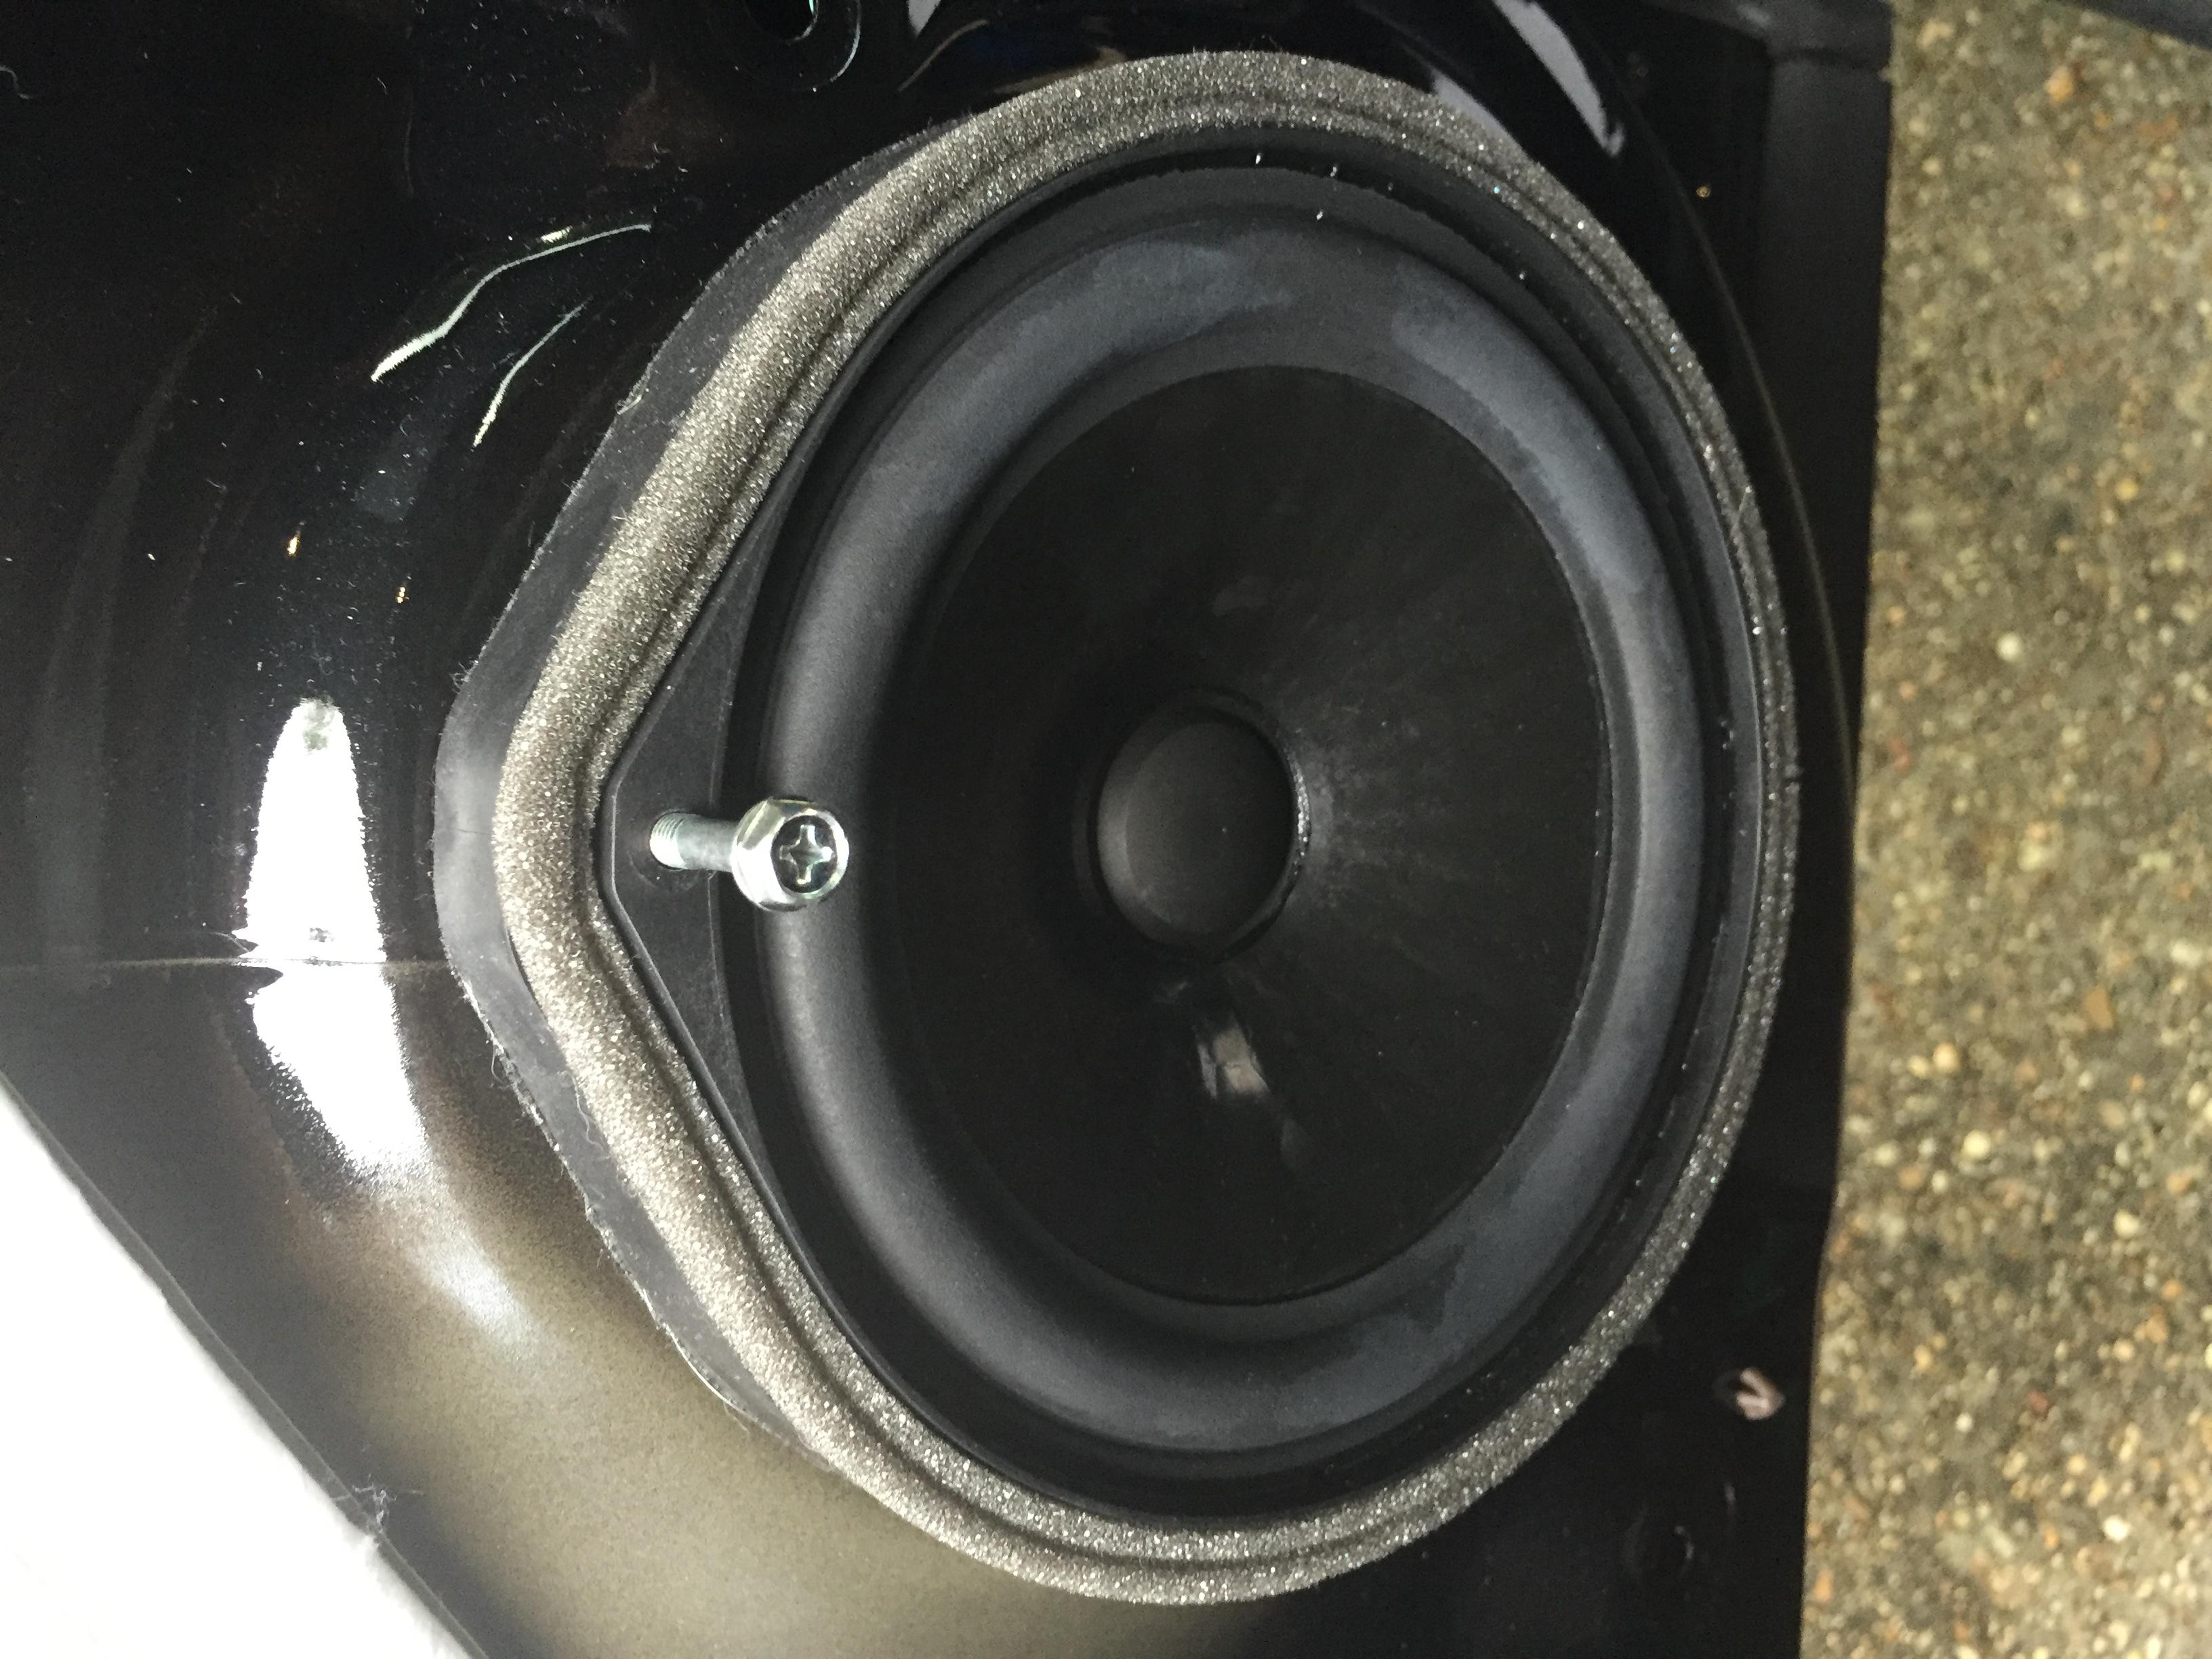 Acura MDX Present Speakers Upgrade Acura MDX Forum - Acura mdxers